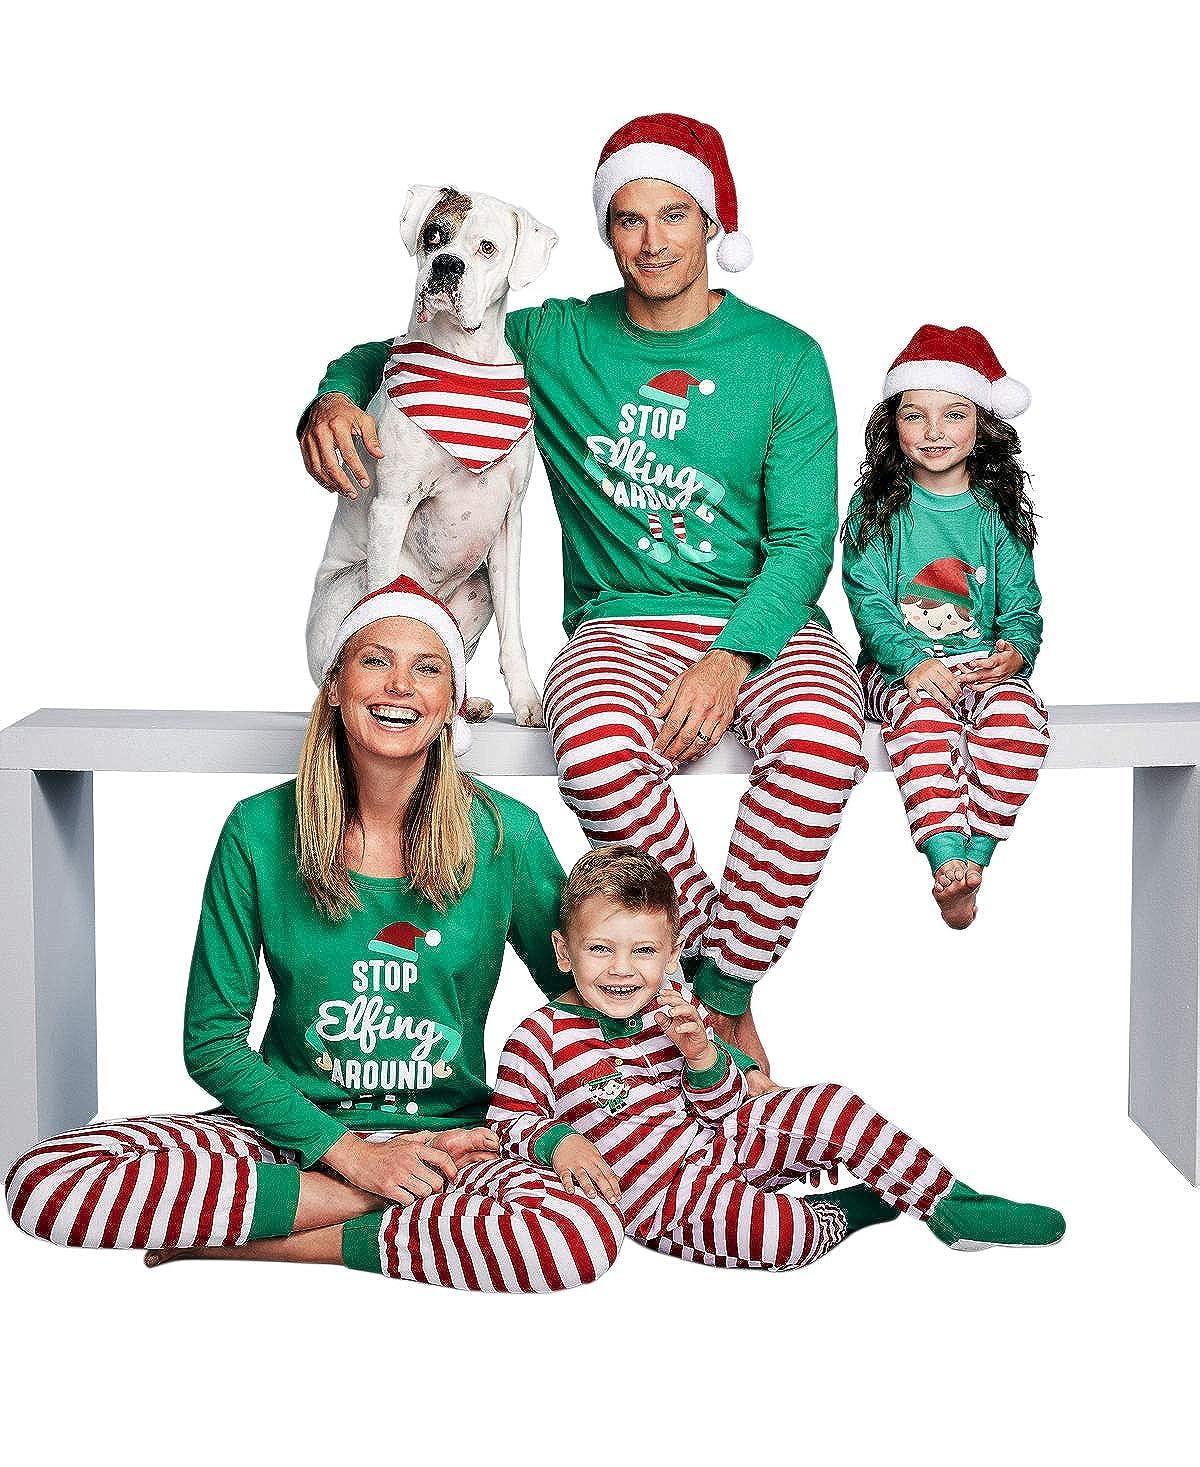 cef823aaf Christmas Family Matching Pajamas Homewear Sleepwear Santa Claus Tops Pants  Set: Amazon.co.uk: Clothing